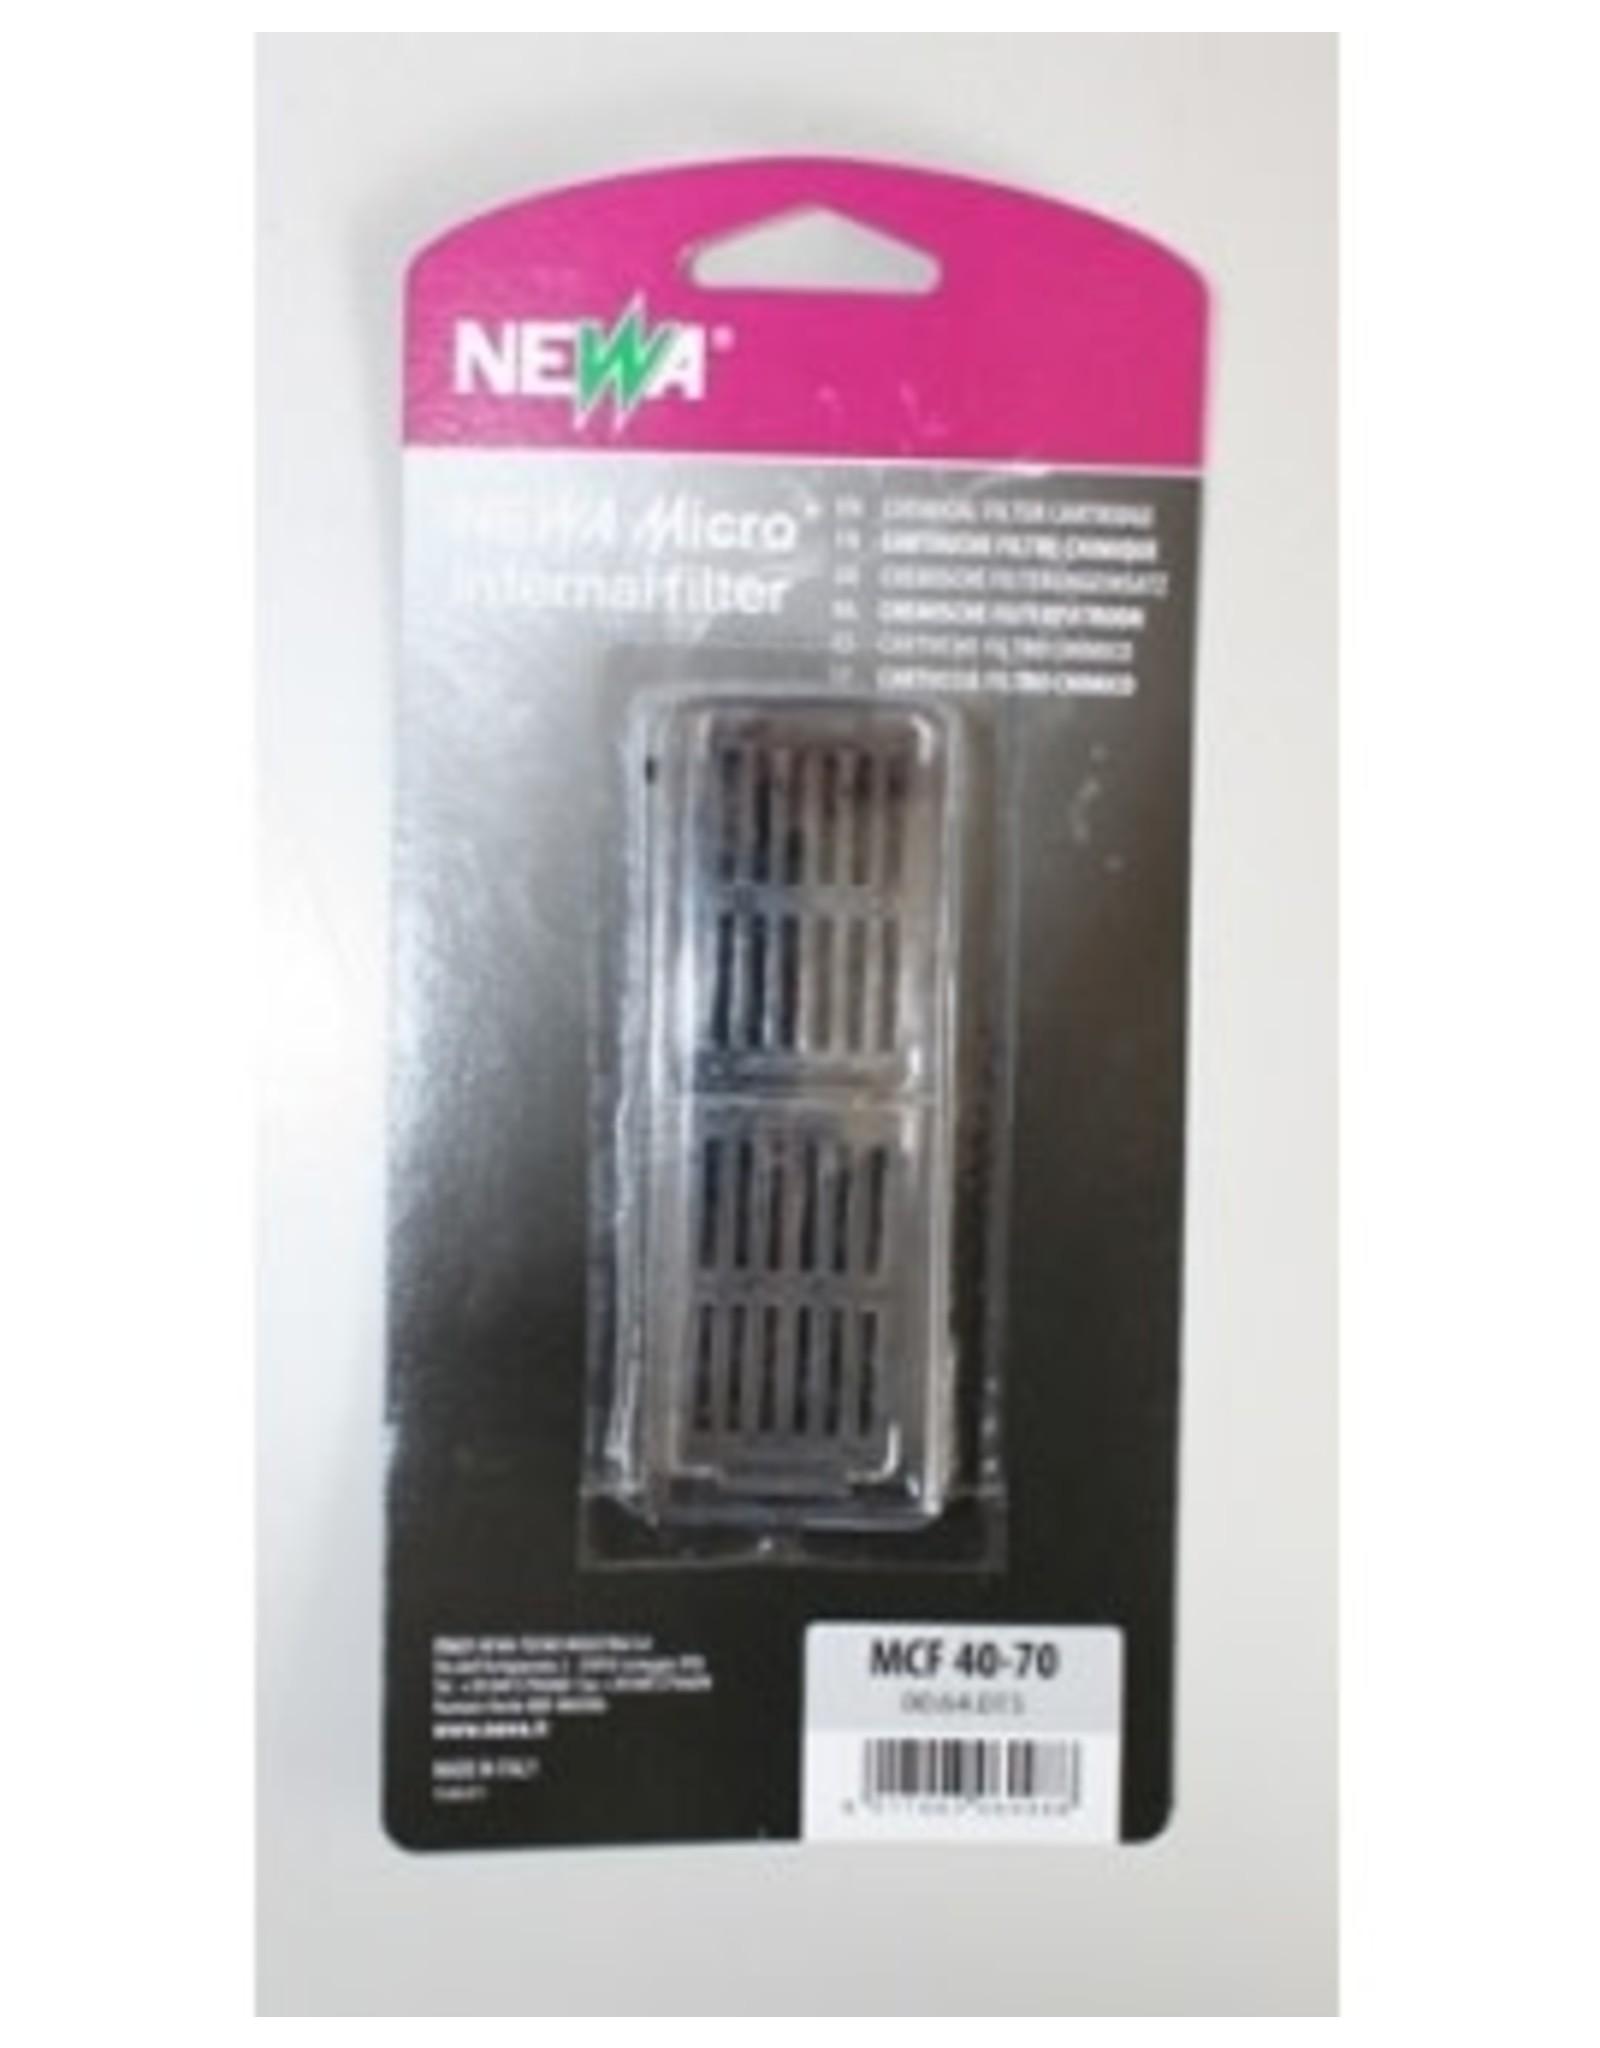 Newa CARTOUCHE charbon 2pcs pour MCF40 & 70